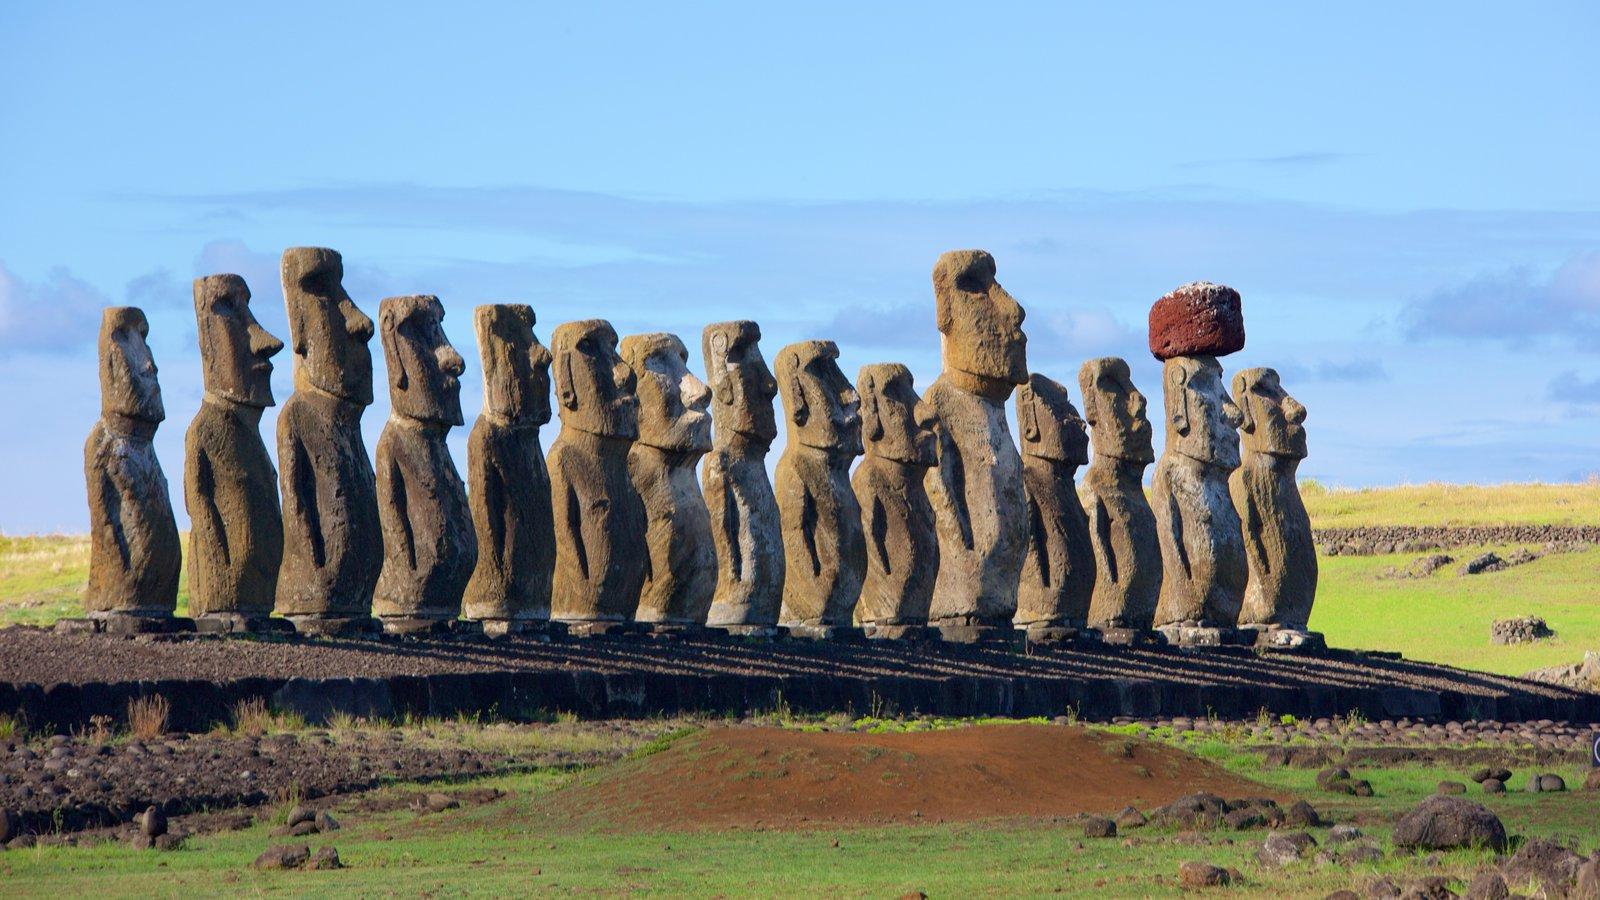 Ahu Tongariki caracterizando elementos de patrimônio e uma estátua ou escultura